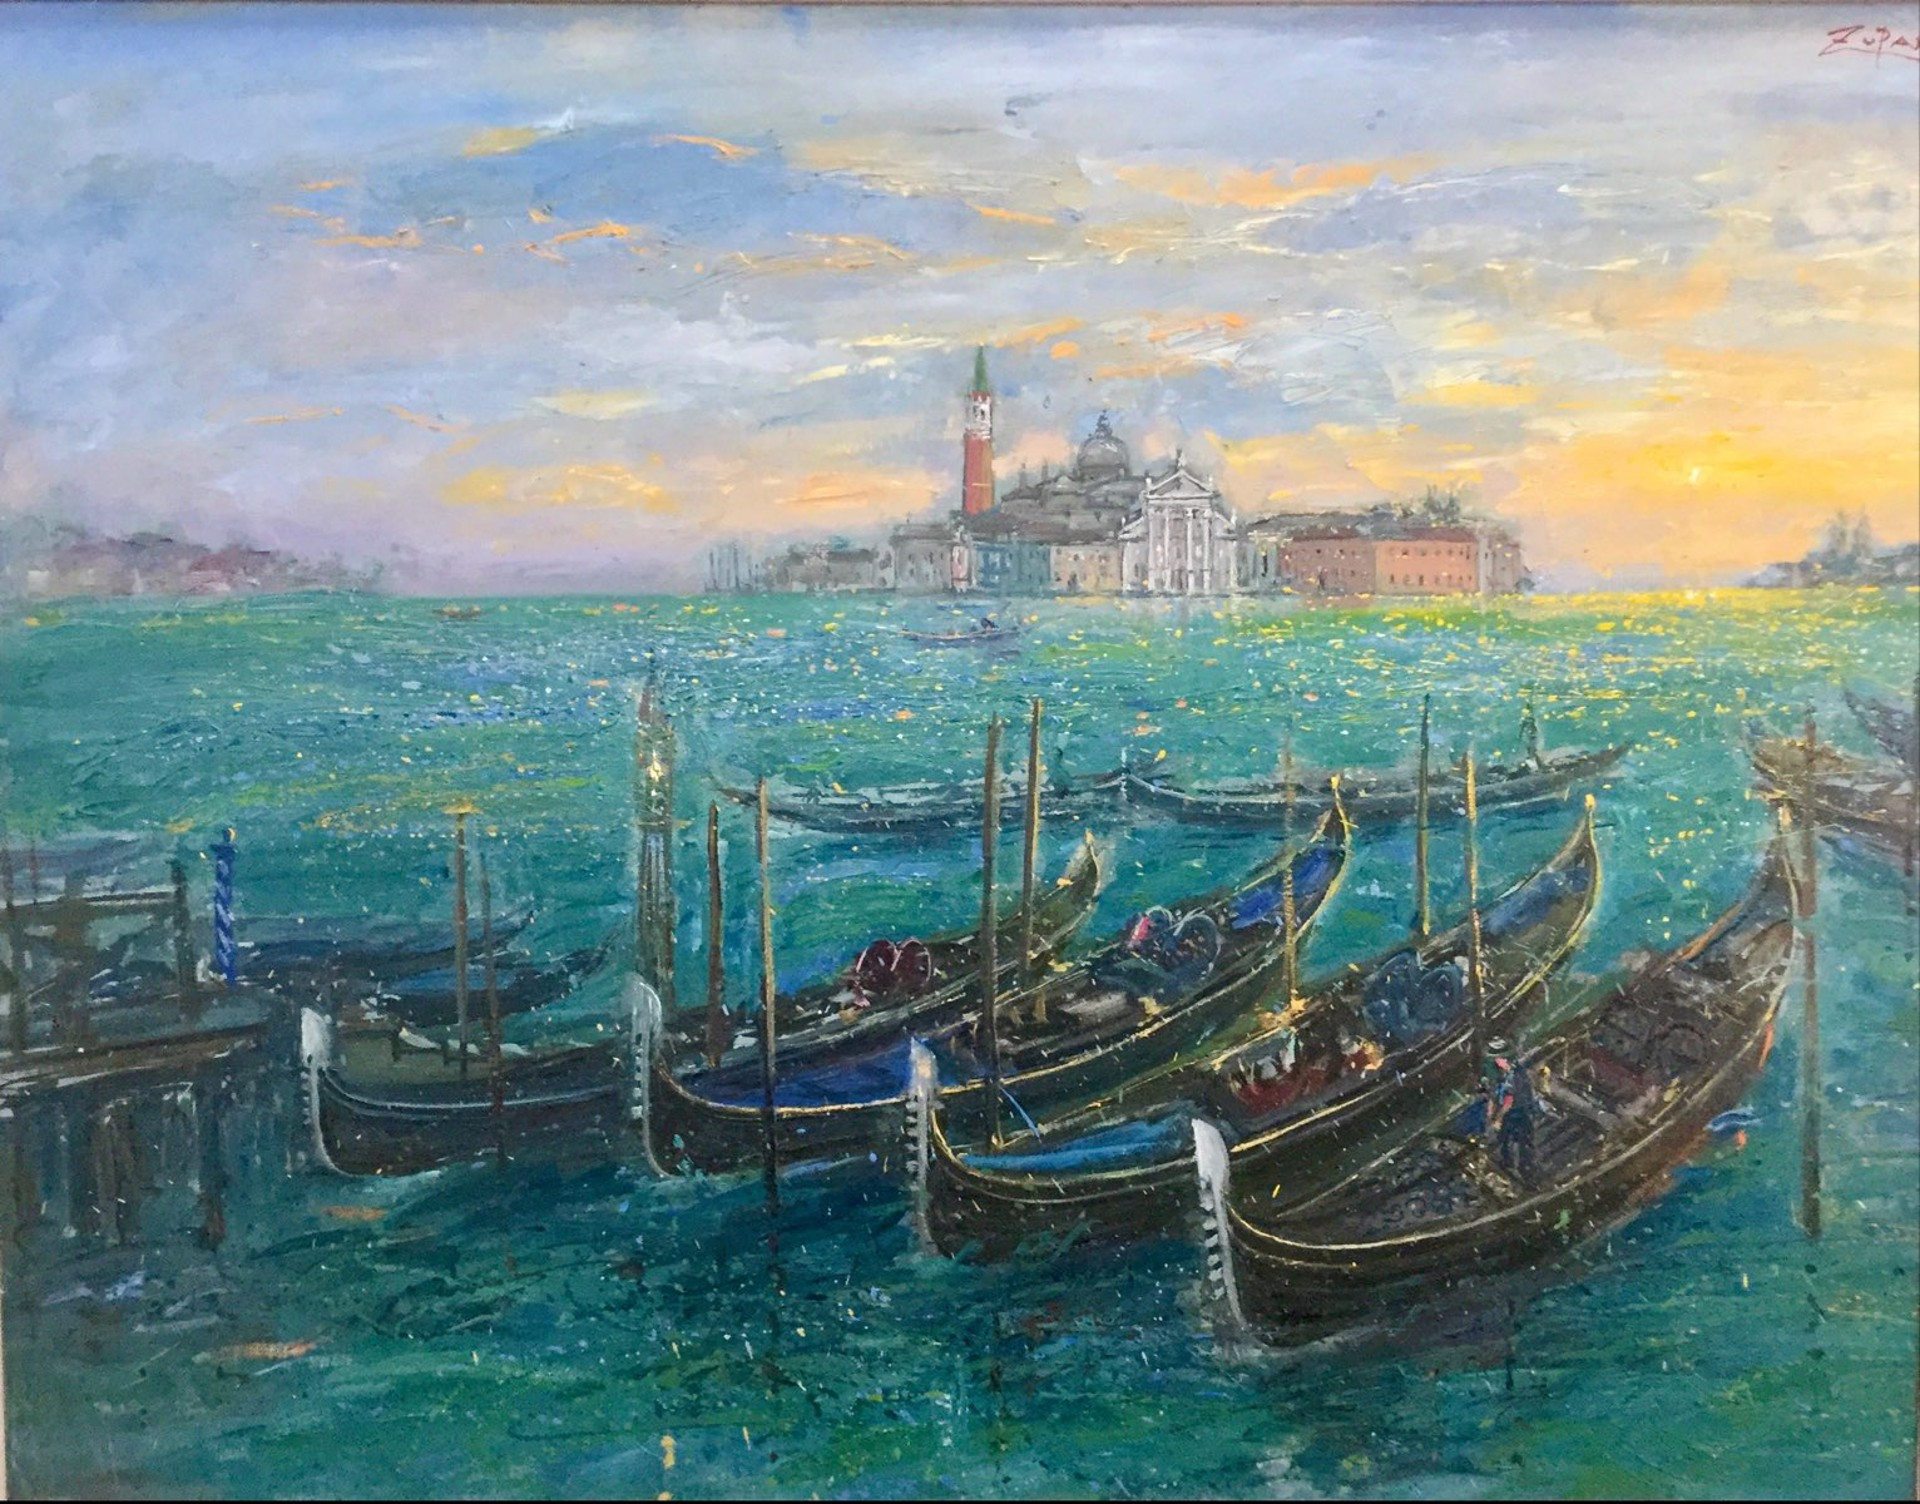 Gondolas In Venice by Bruno Zupan